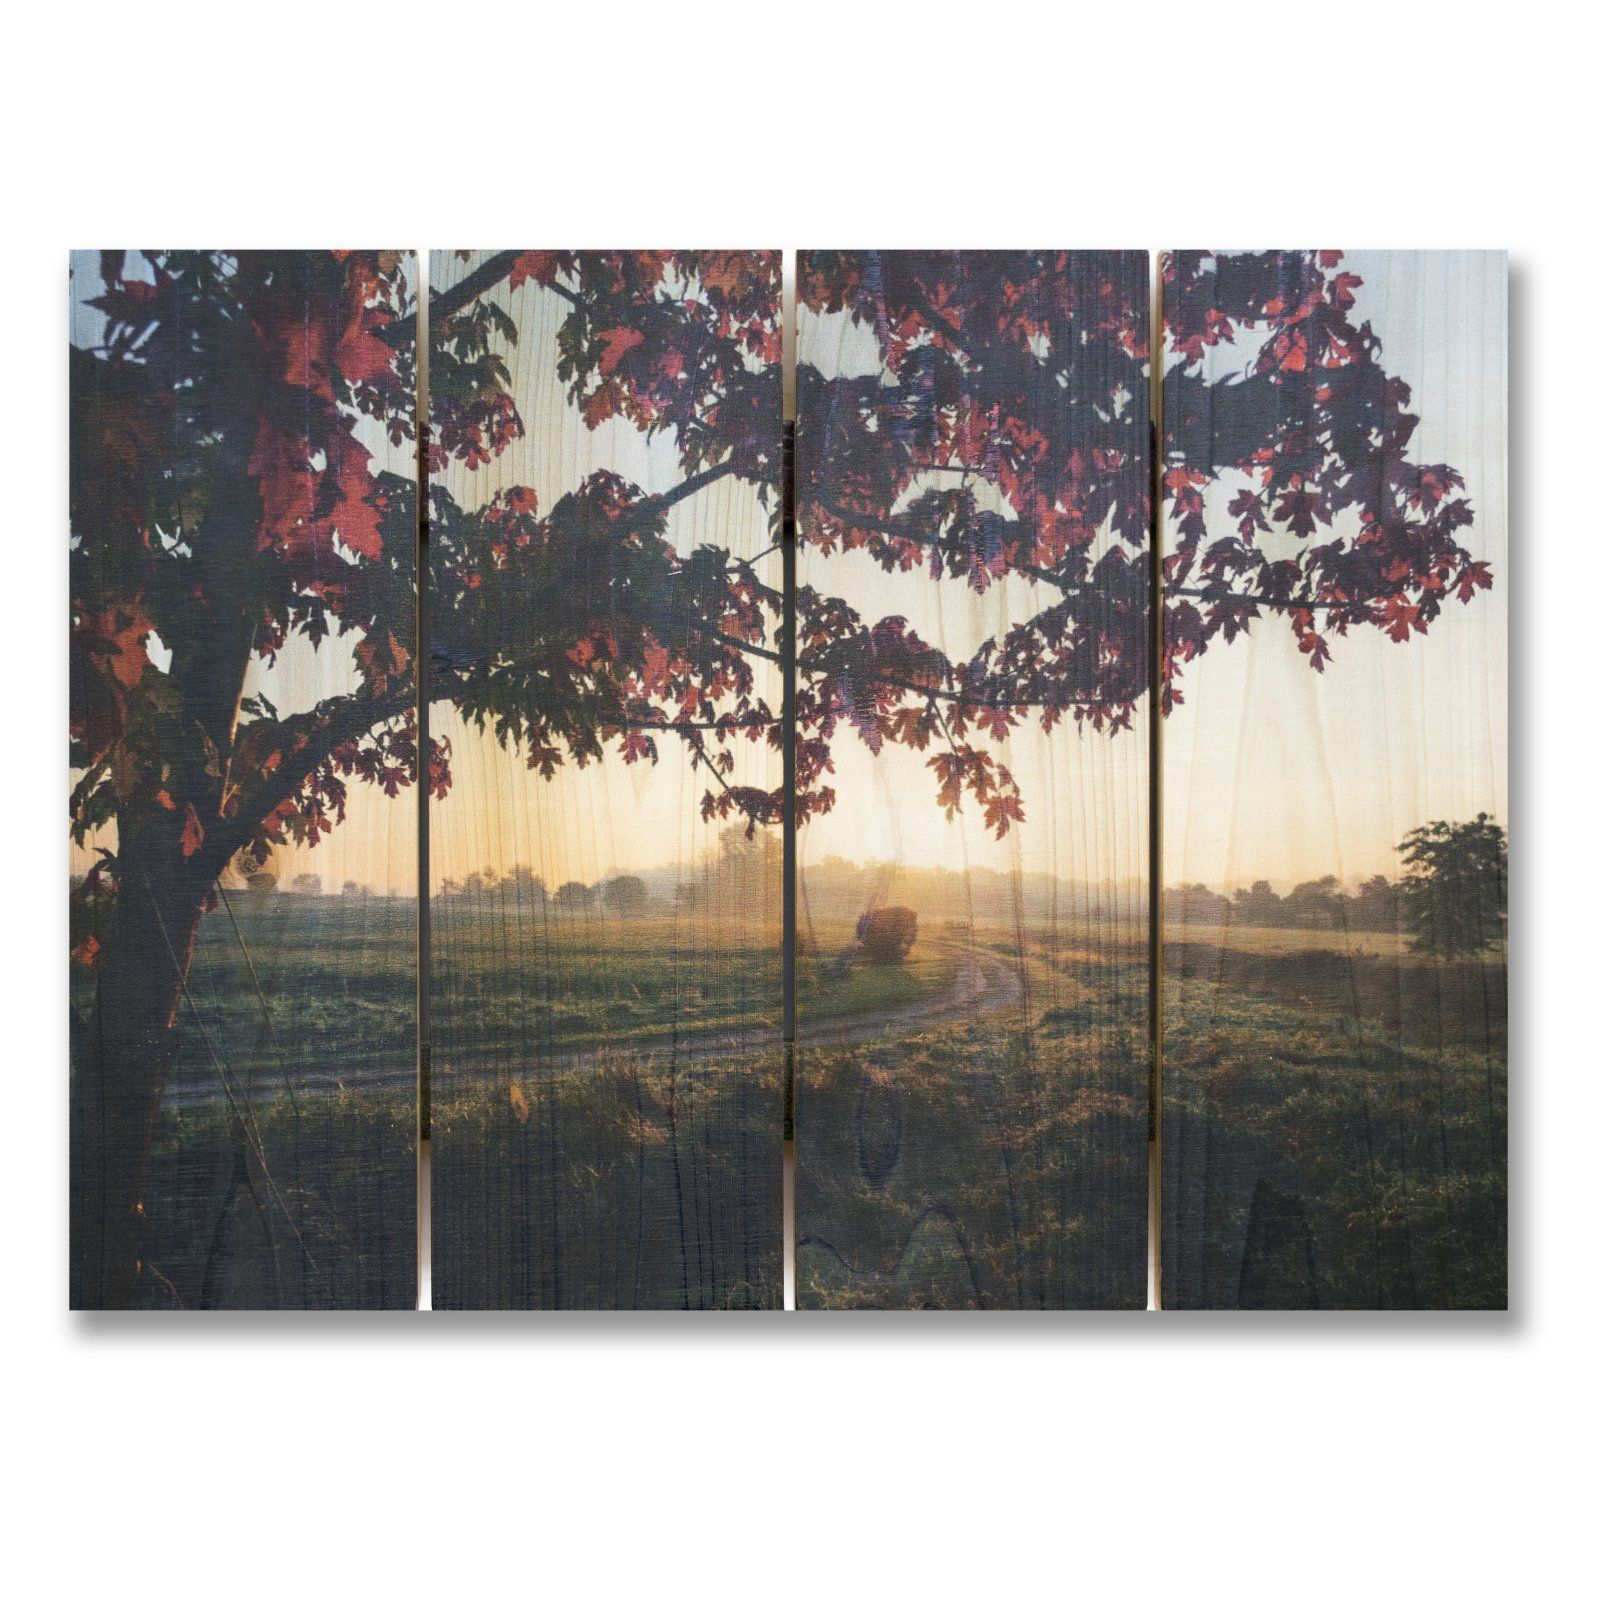 Gizaun Art Autumn Sunset Indoor Outdoor Wall Art Products In 2019